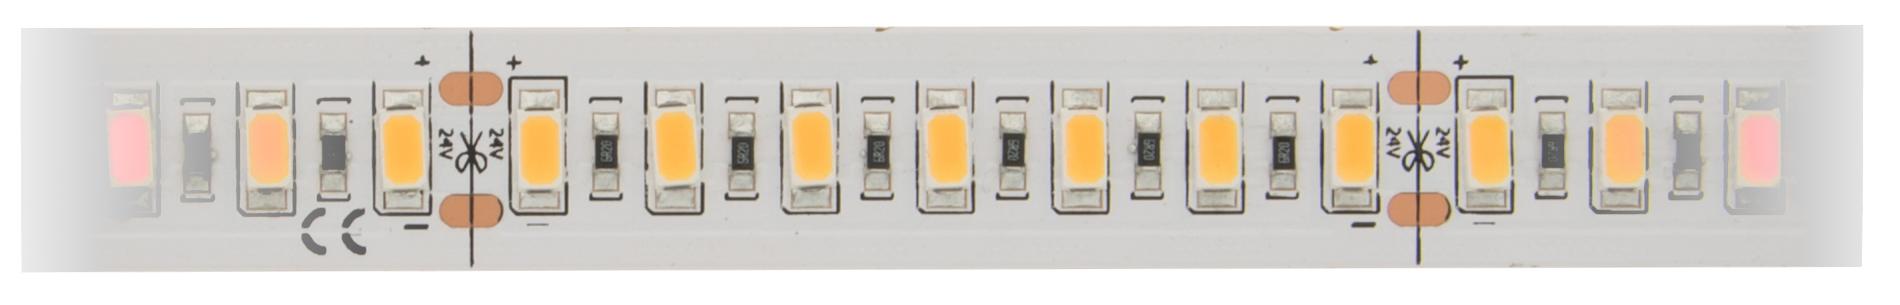 1 Stk FS 160, CLW, Ra=90+, 37,0W/m, 2850lm/m, 24VDC, IP20, l=5m LIFS019000